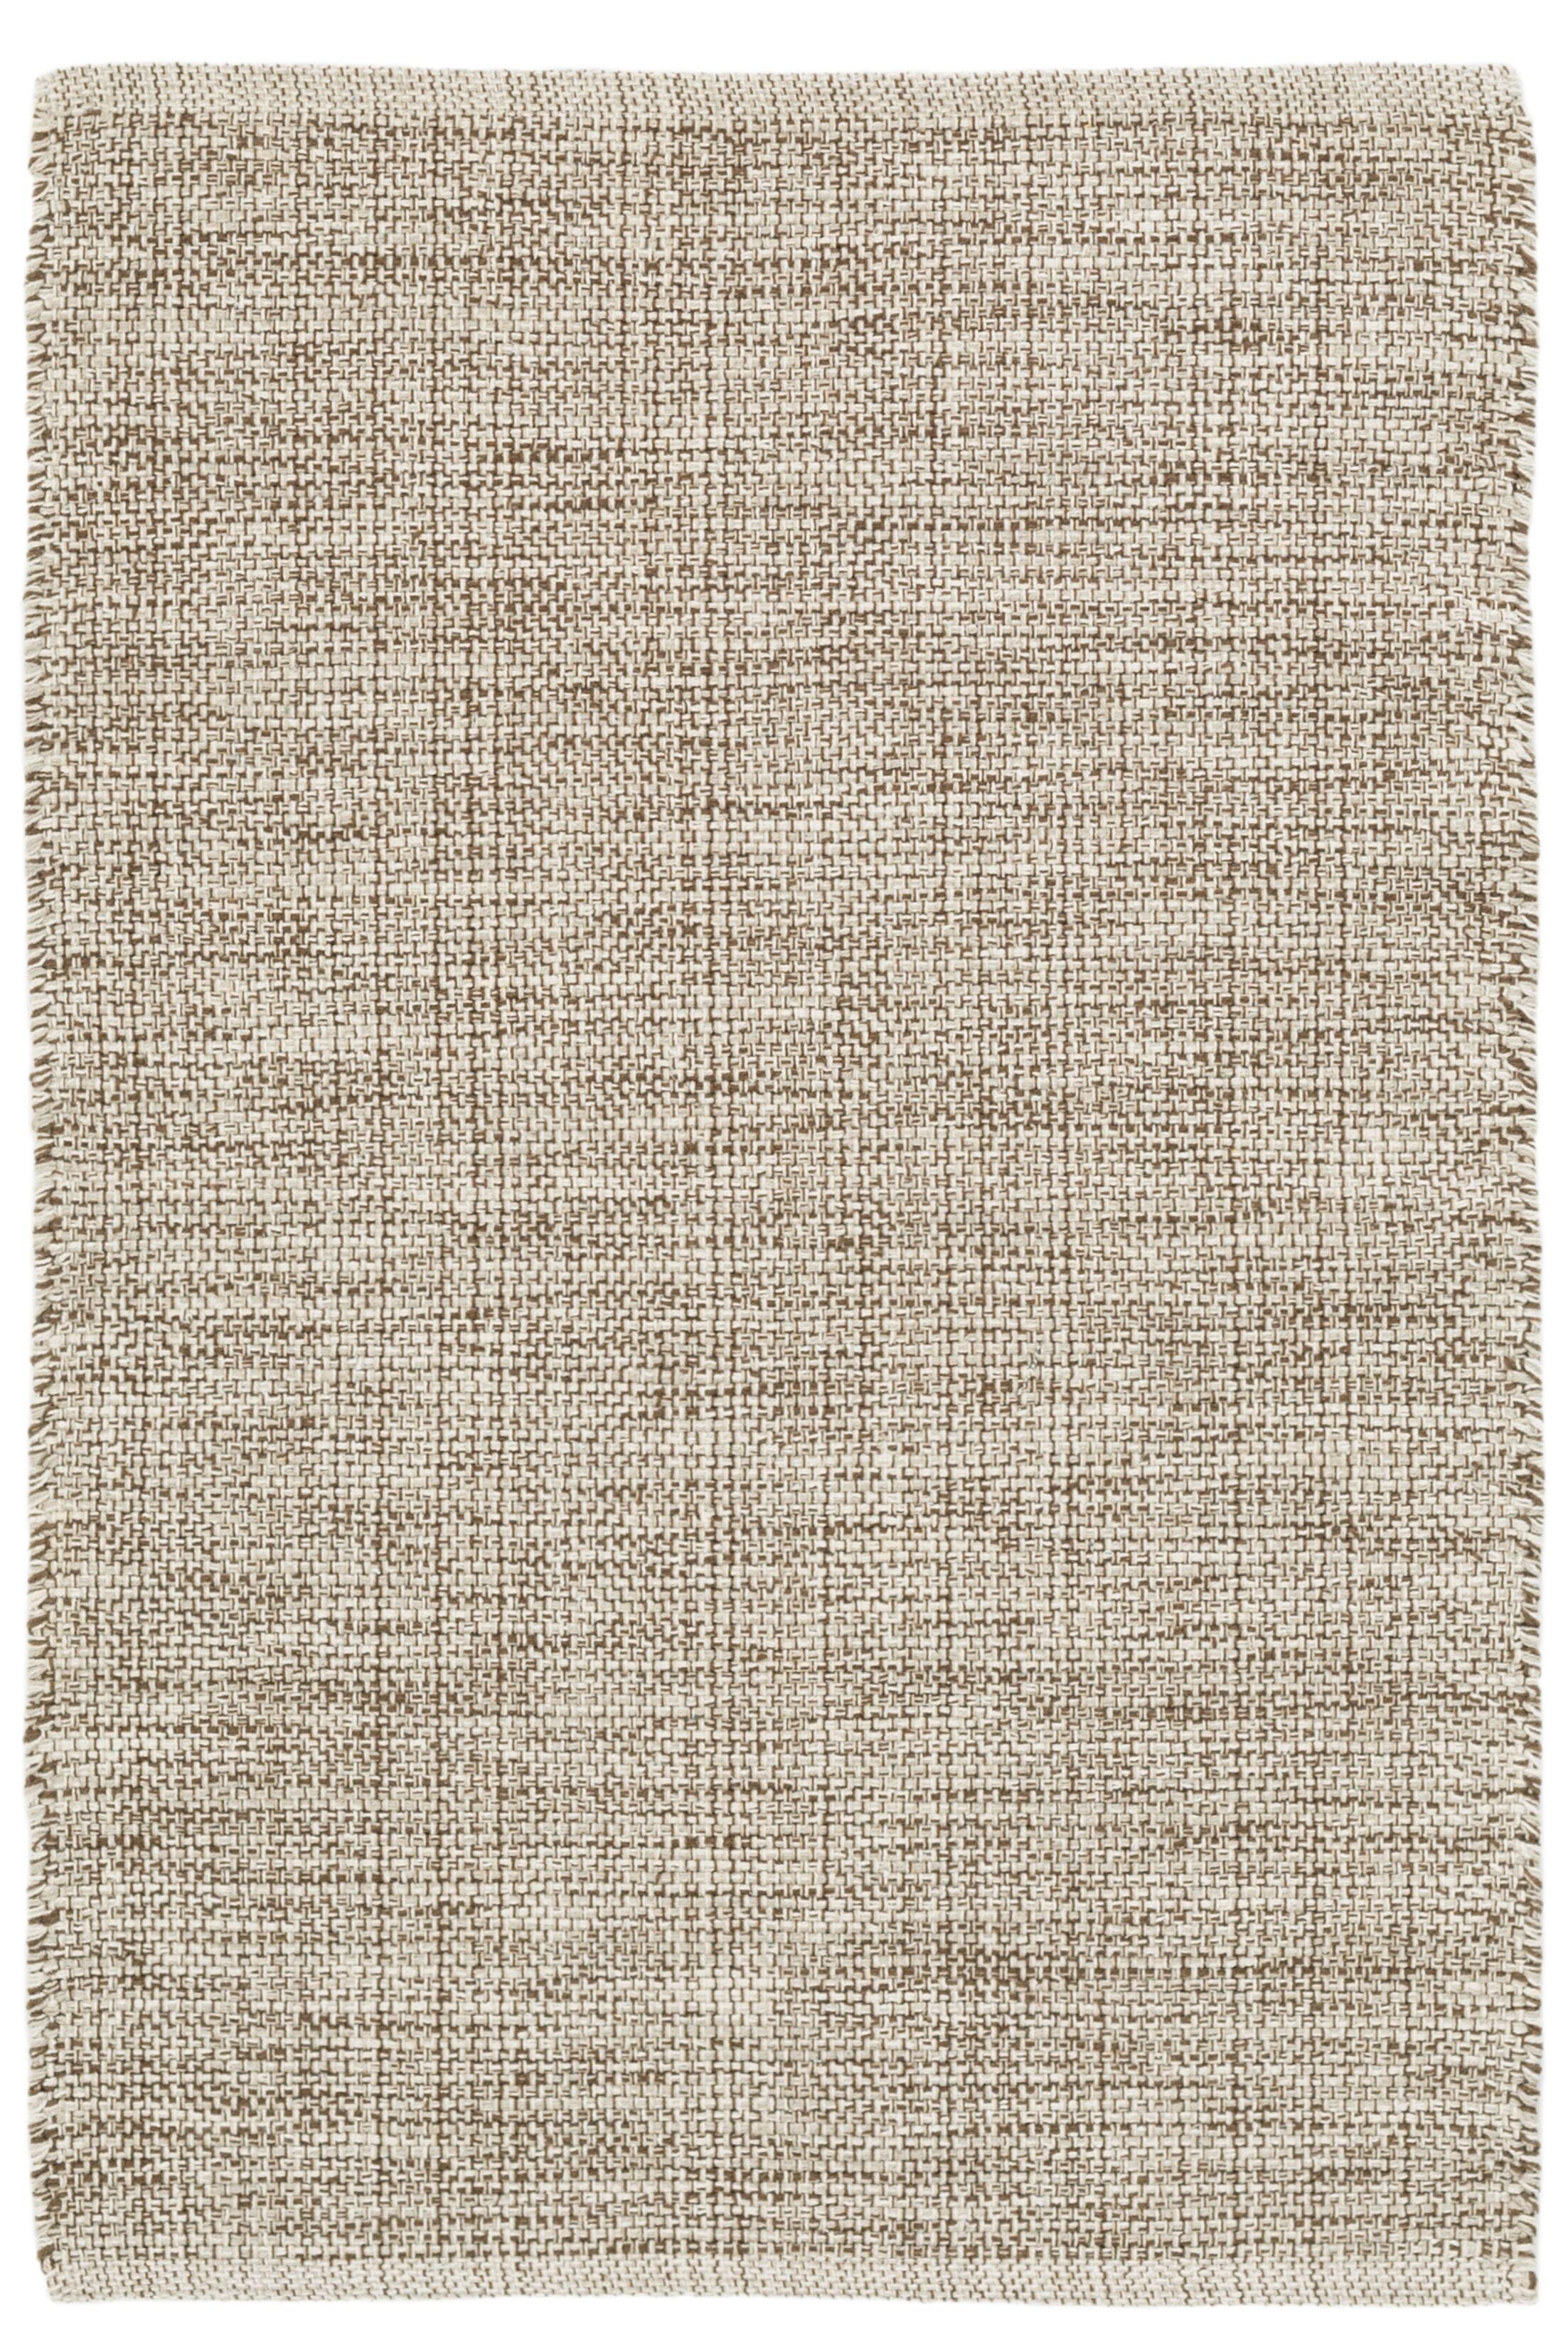 Marled Brown/Beige Area Rug Rug Size: 4' x 6'